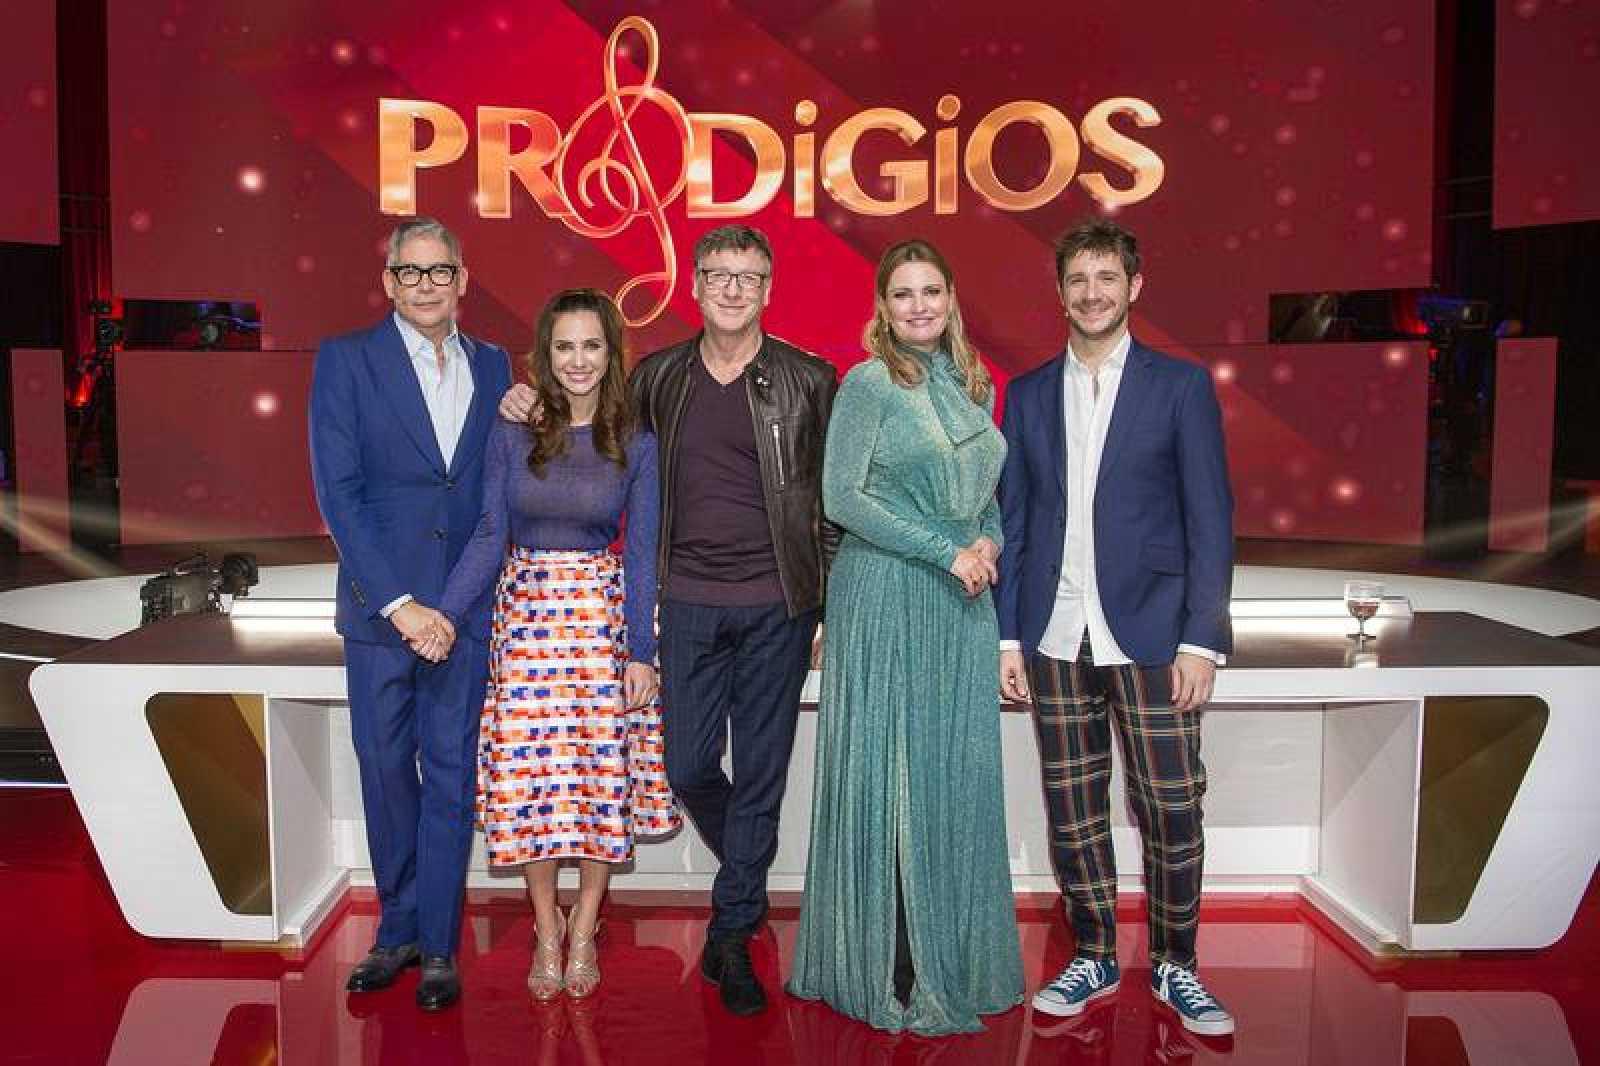 Boris Izaguirre, Paula Prendes, Nacho Duato, Ainhoa Arteta y Andrés Salado